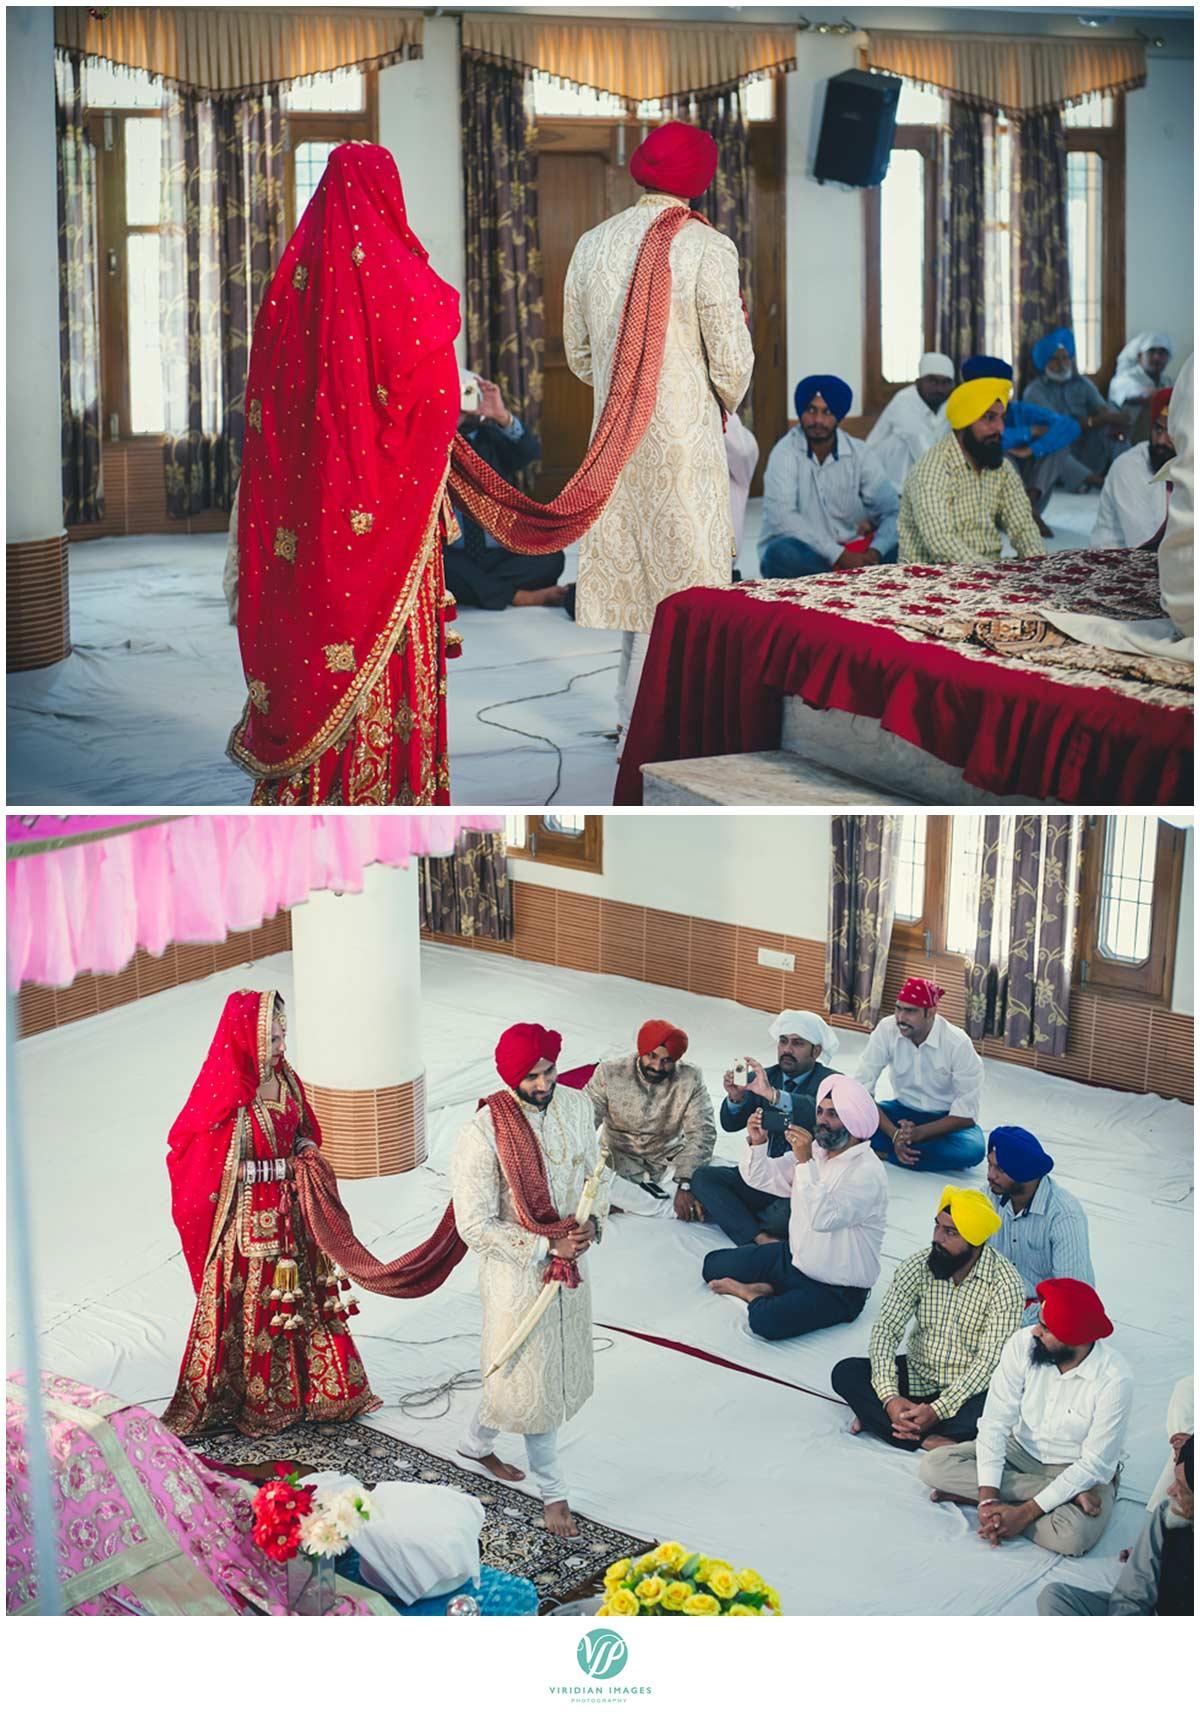 India_Chandigarh_Wedding_Viridian_Images_Photography_poto_25